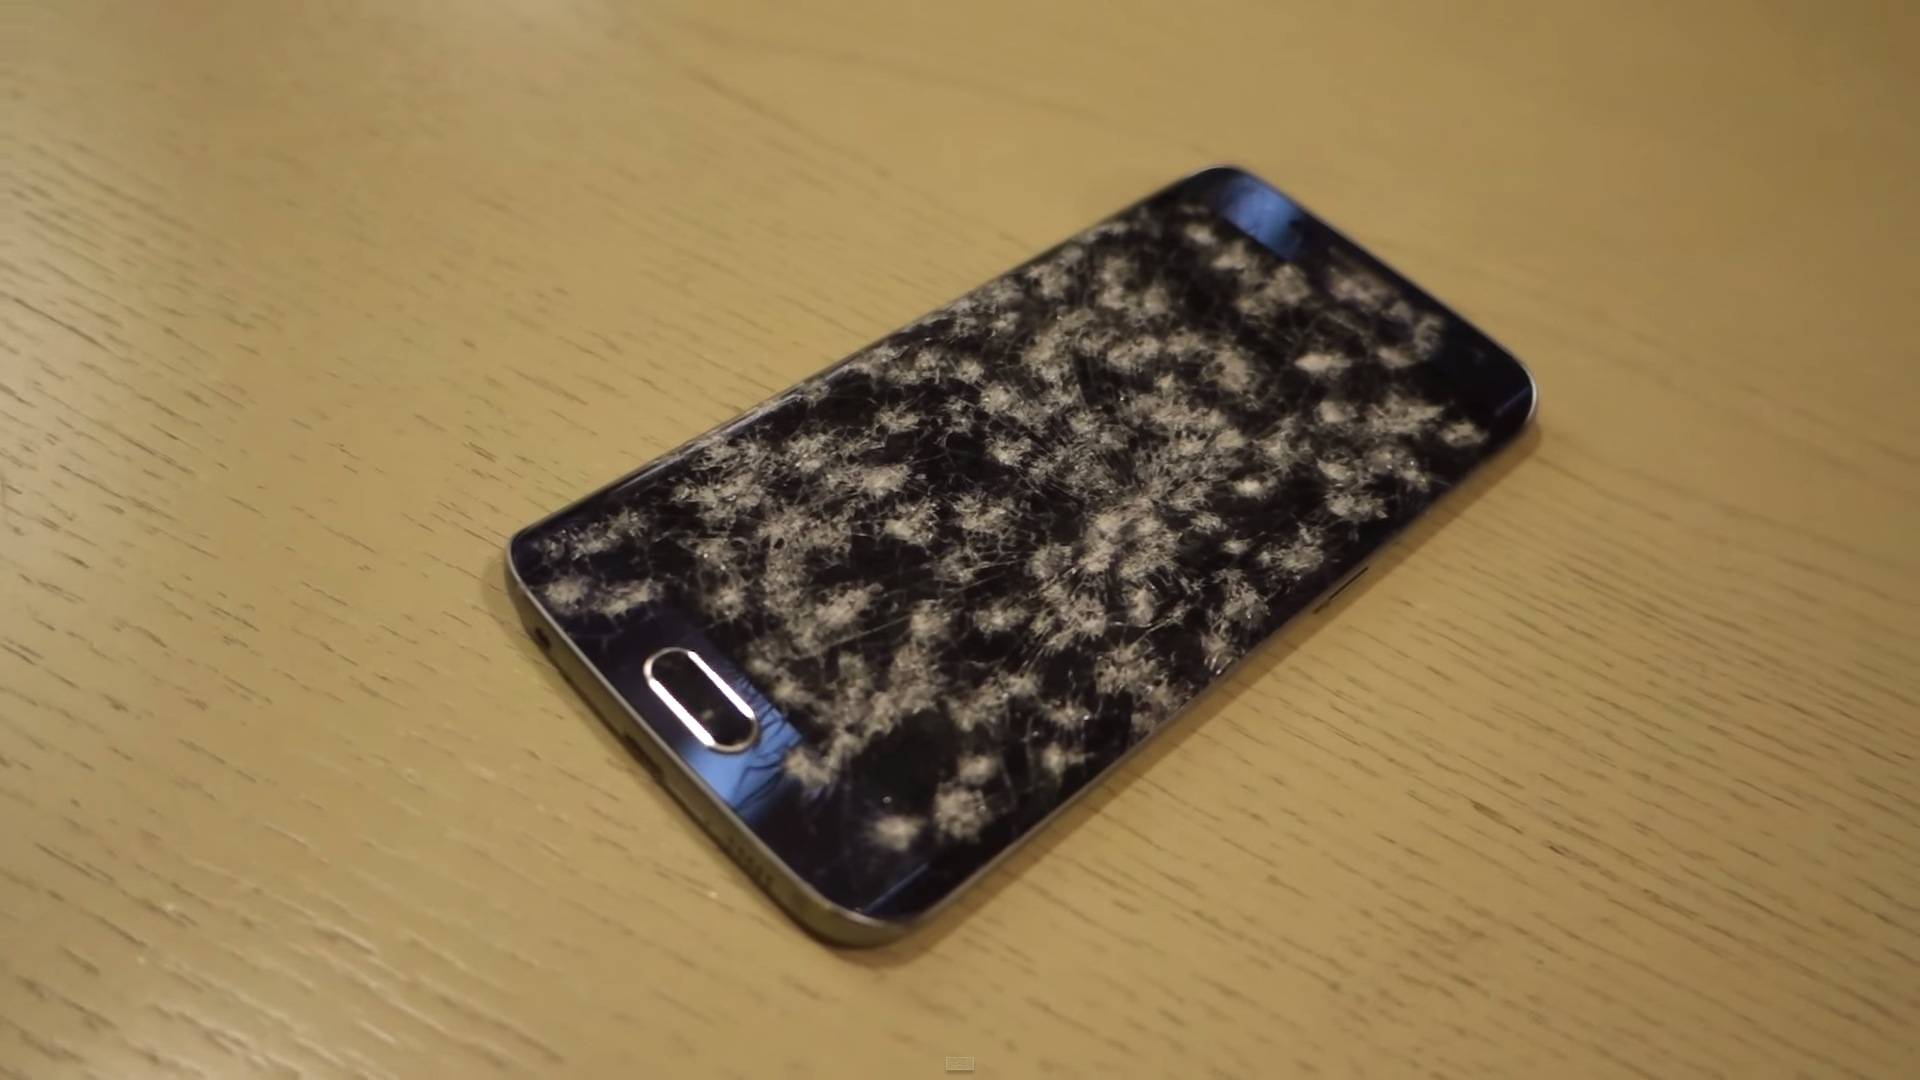 Galaxy S6 Edge test hammer (2)